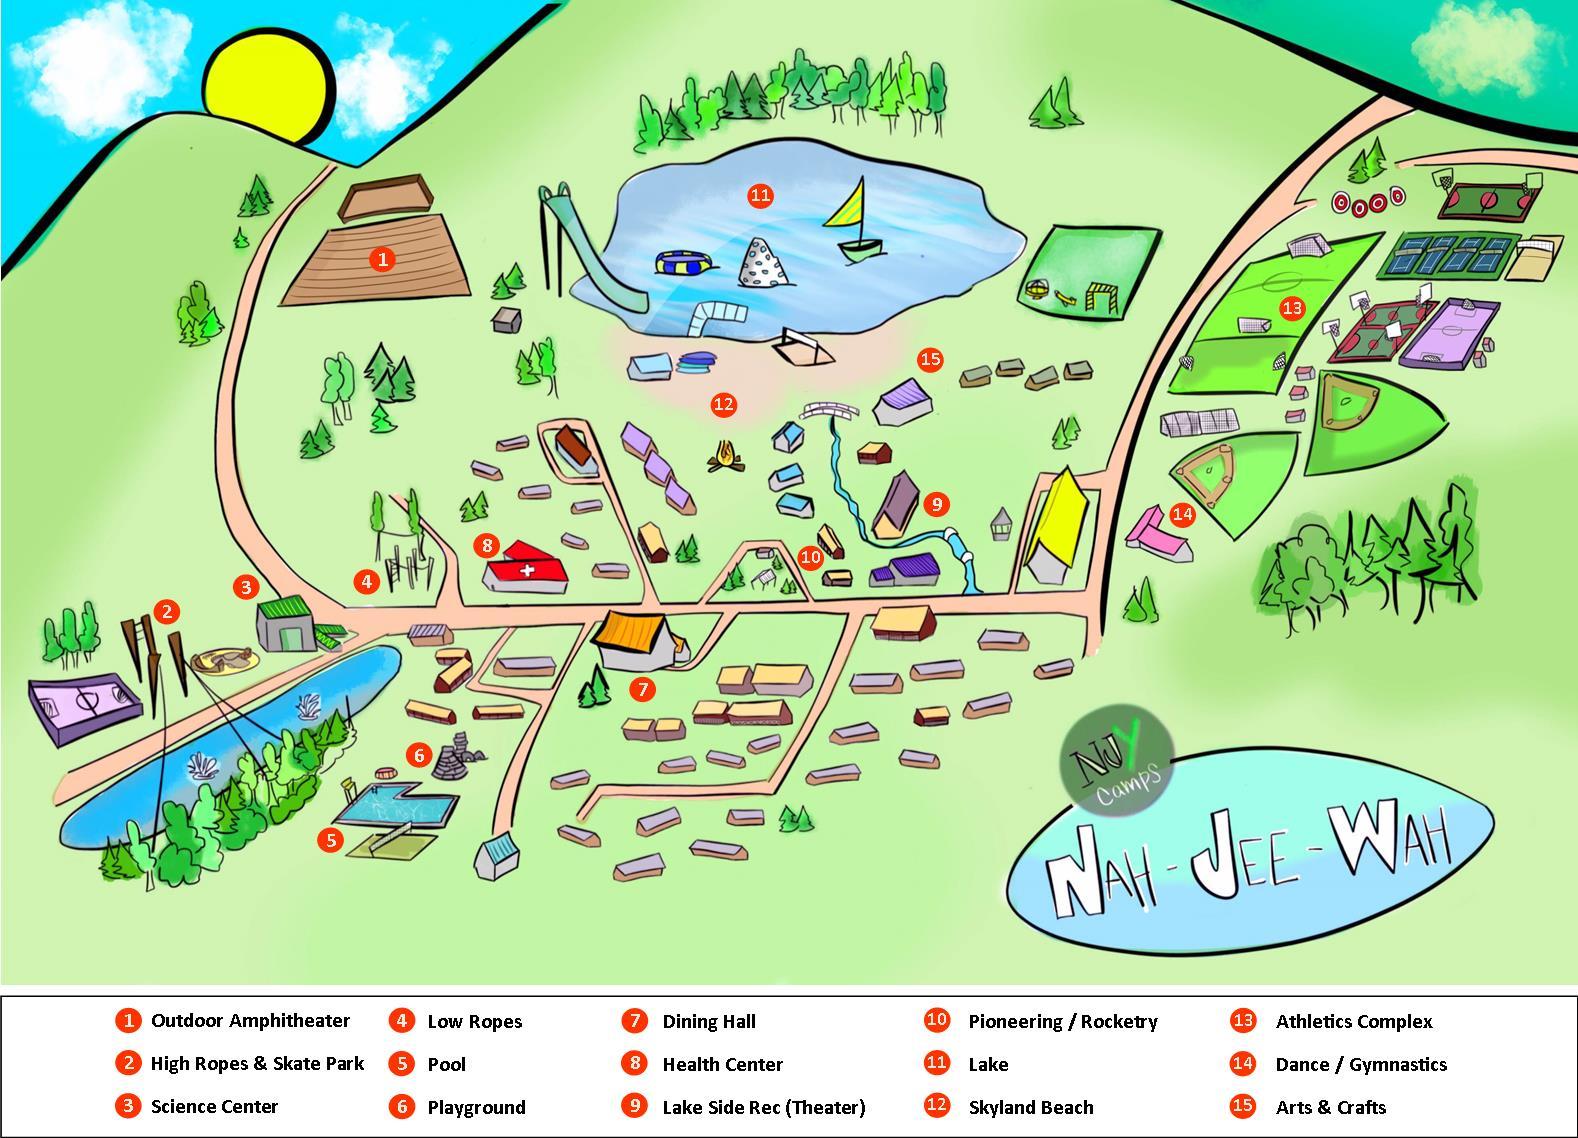 NJW Map